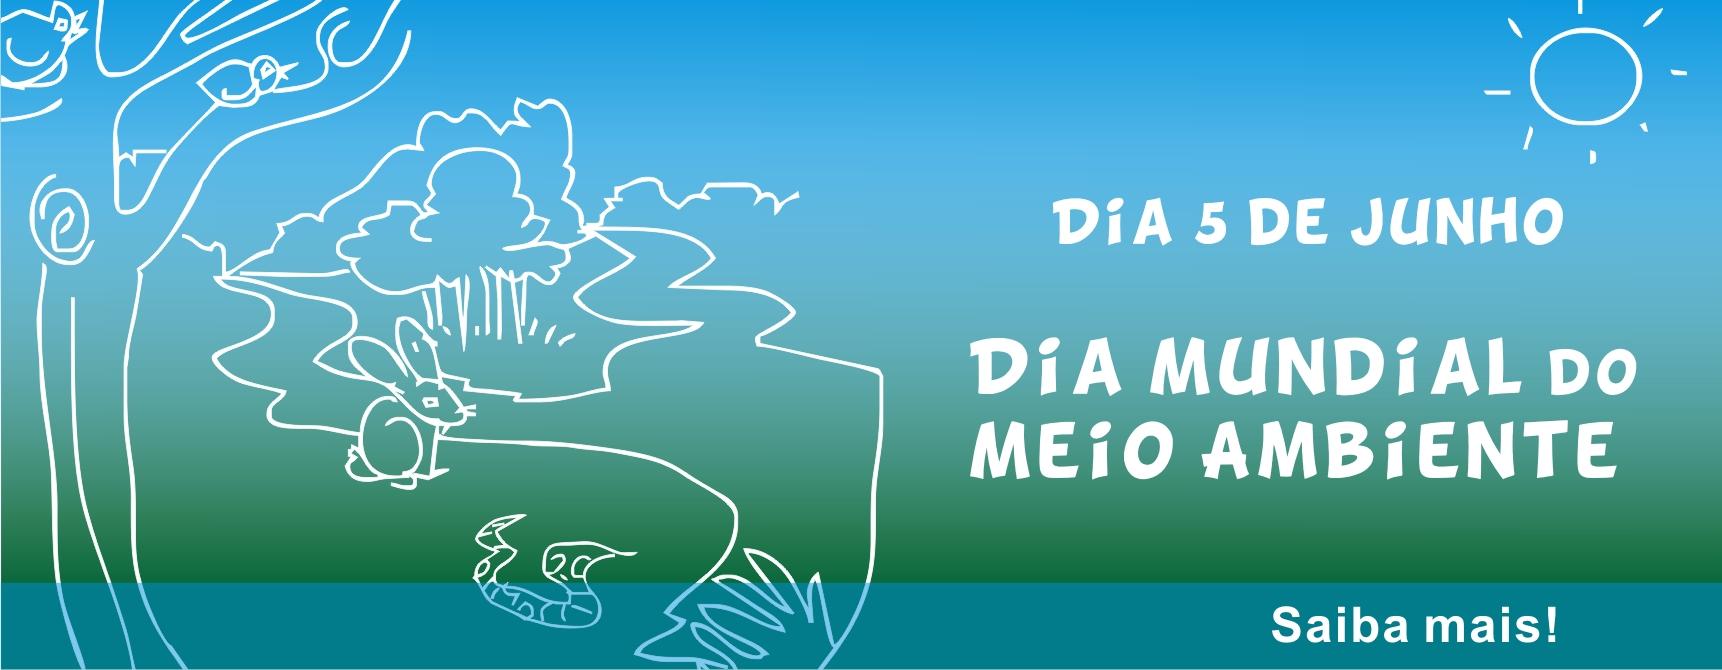 trilhas dia mundial meio ambiente 2014 banner site